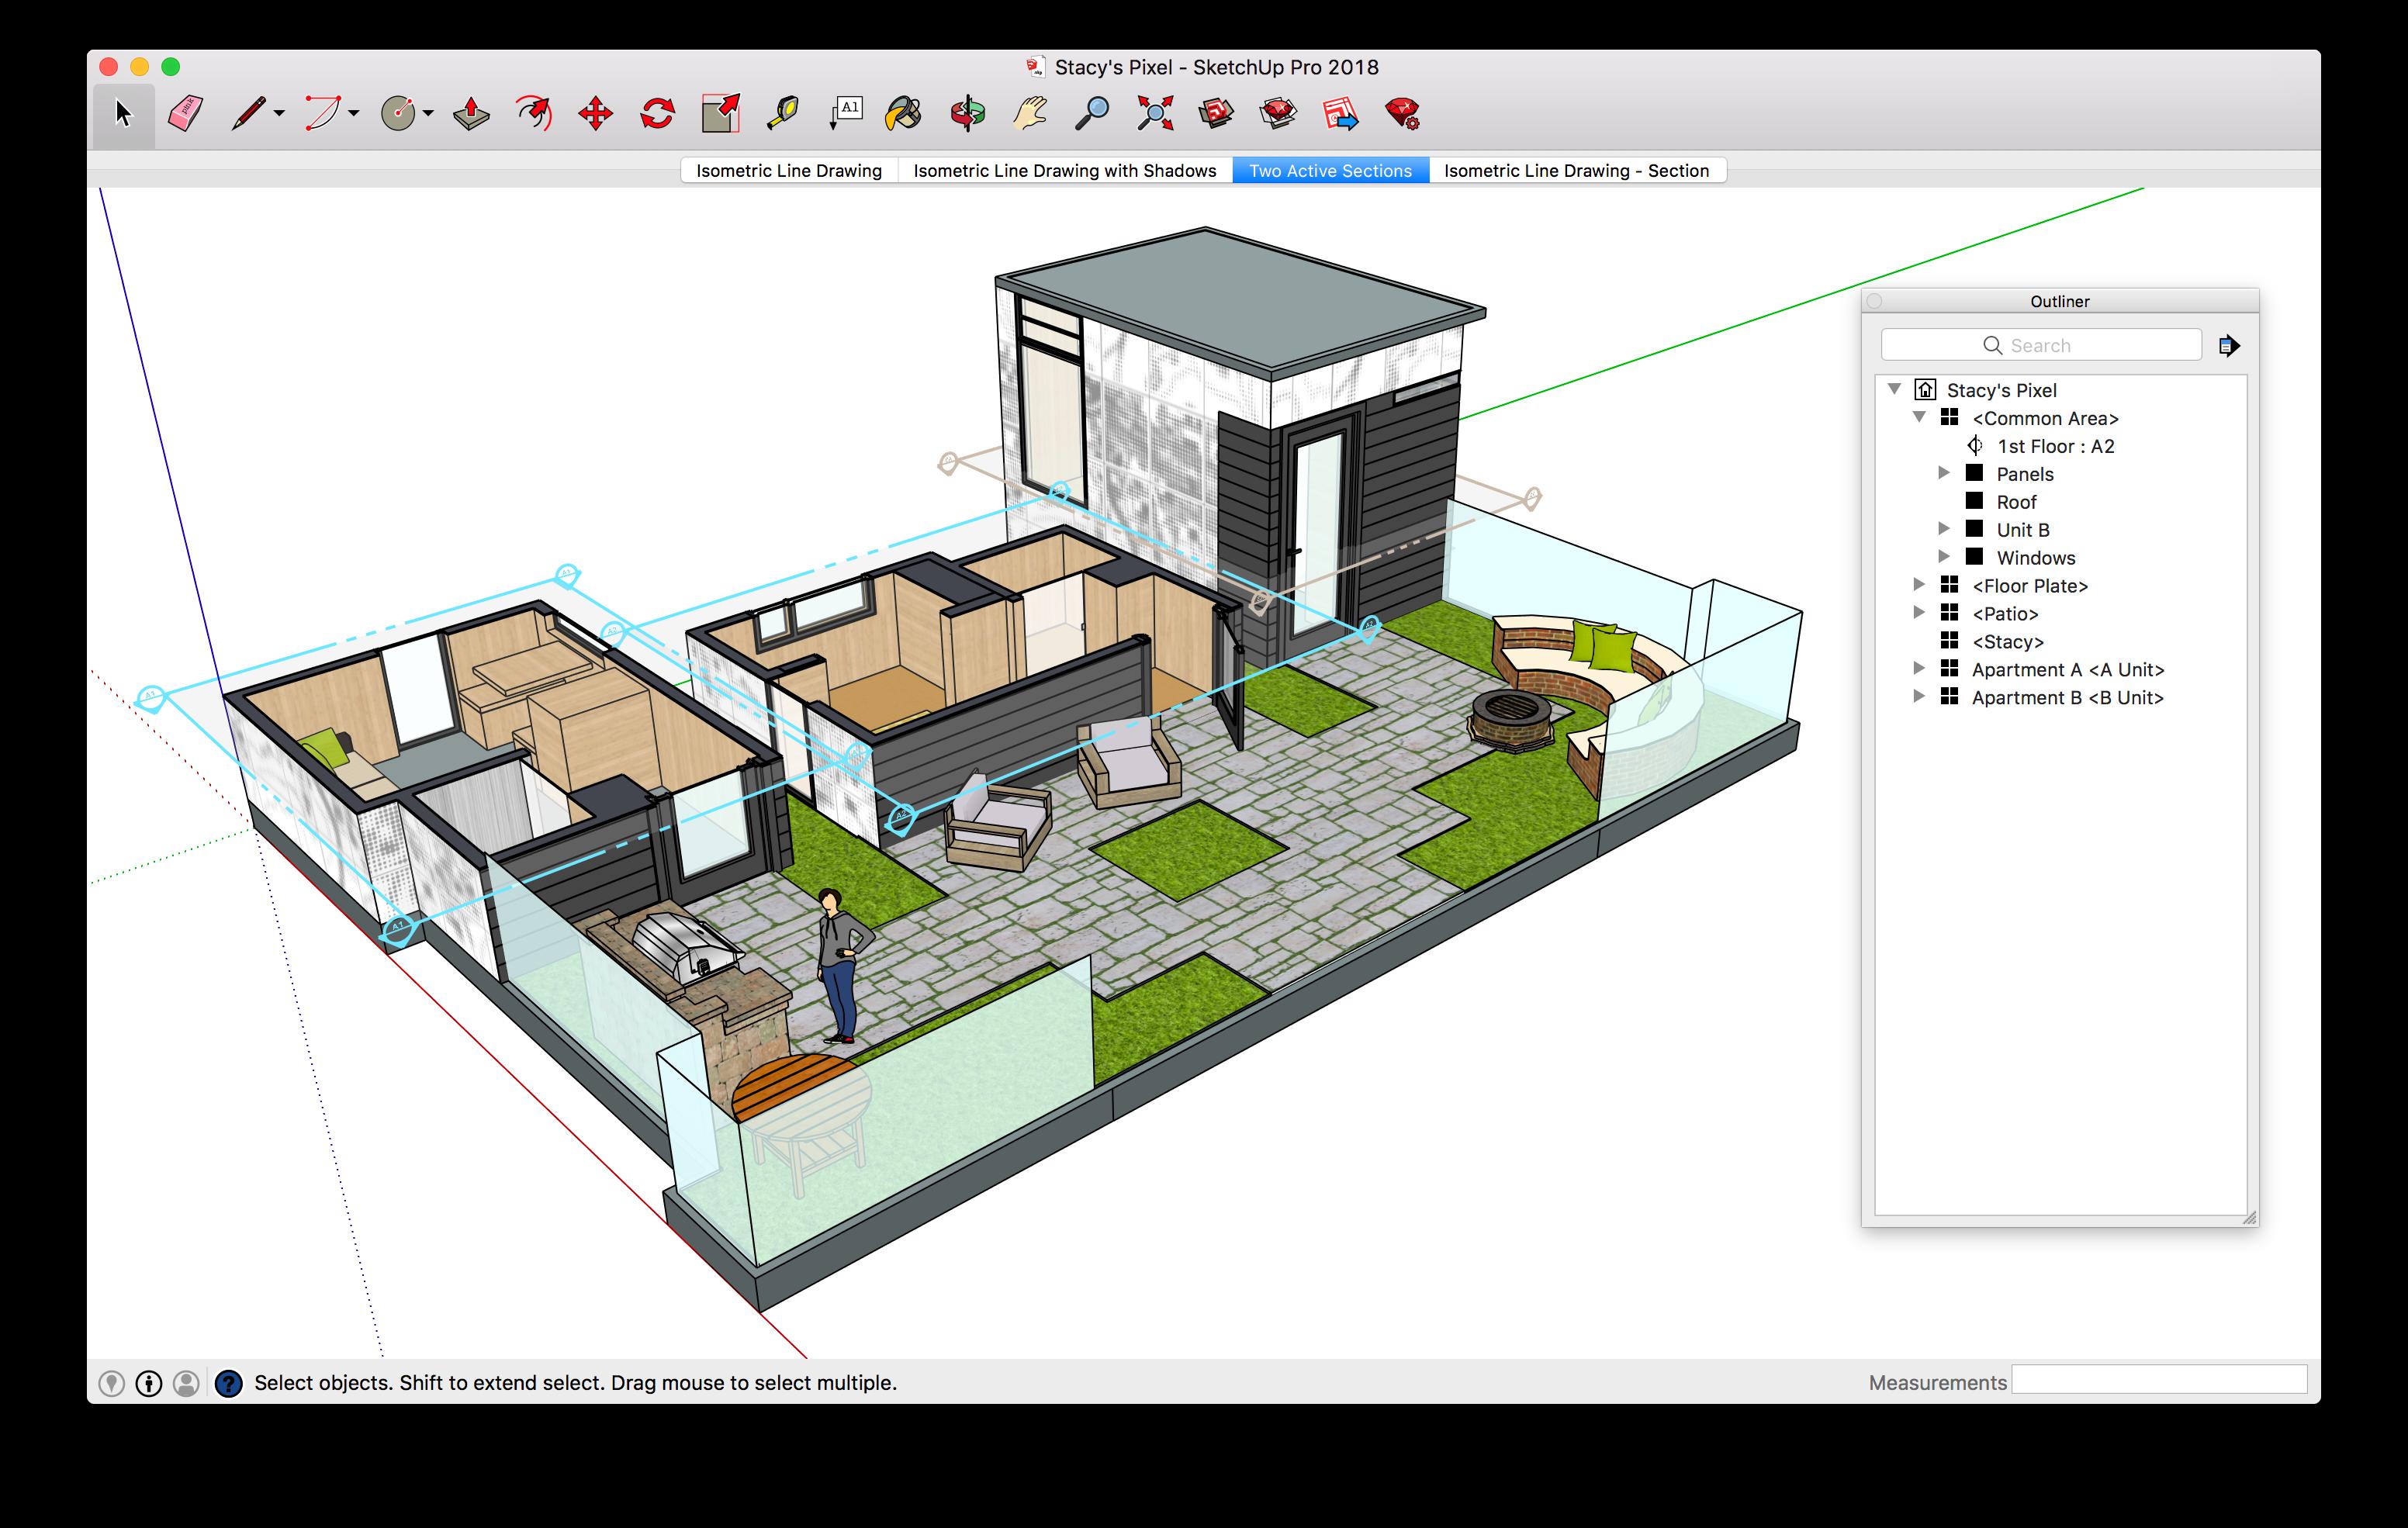 Google New 2018 Sketchup Pro Architecture Model Architecture